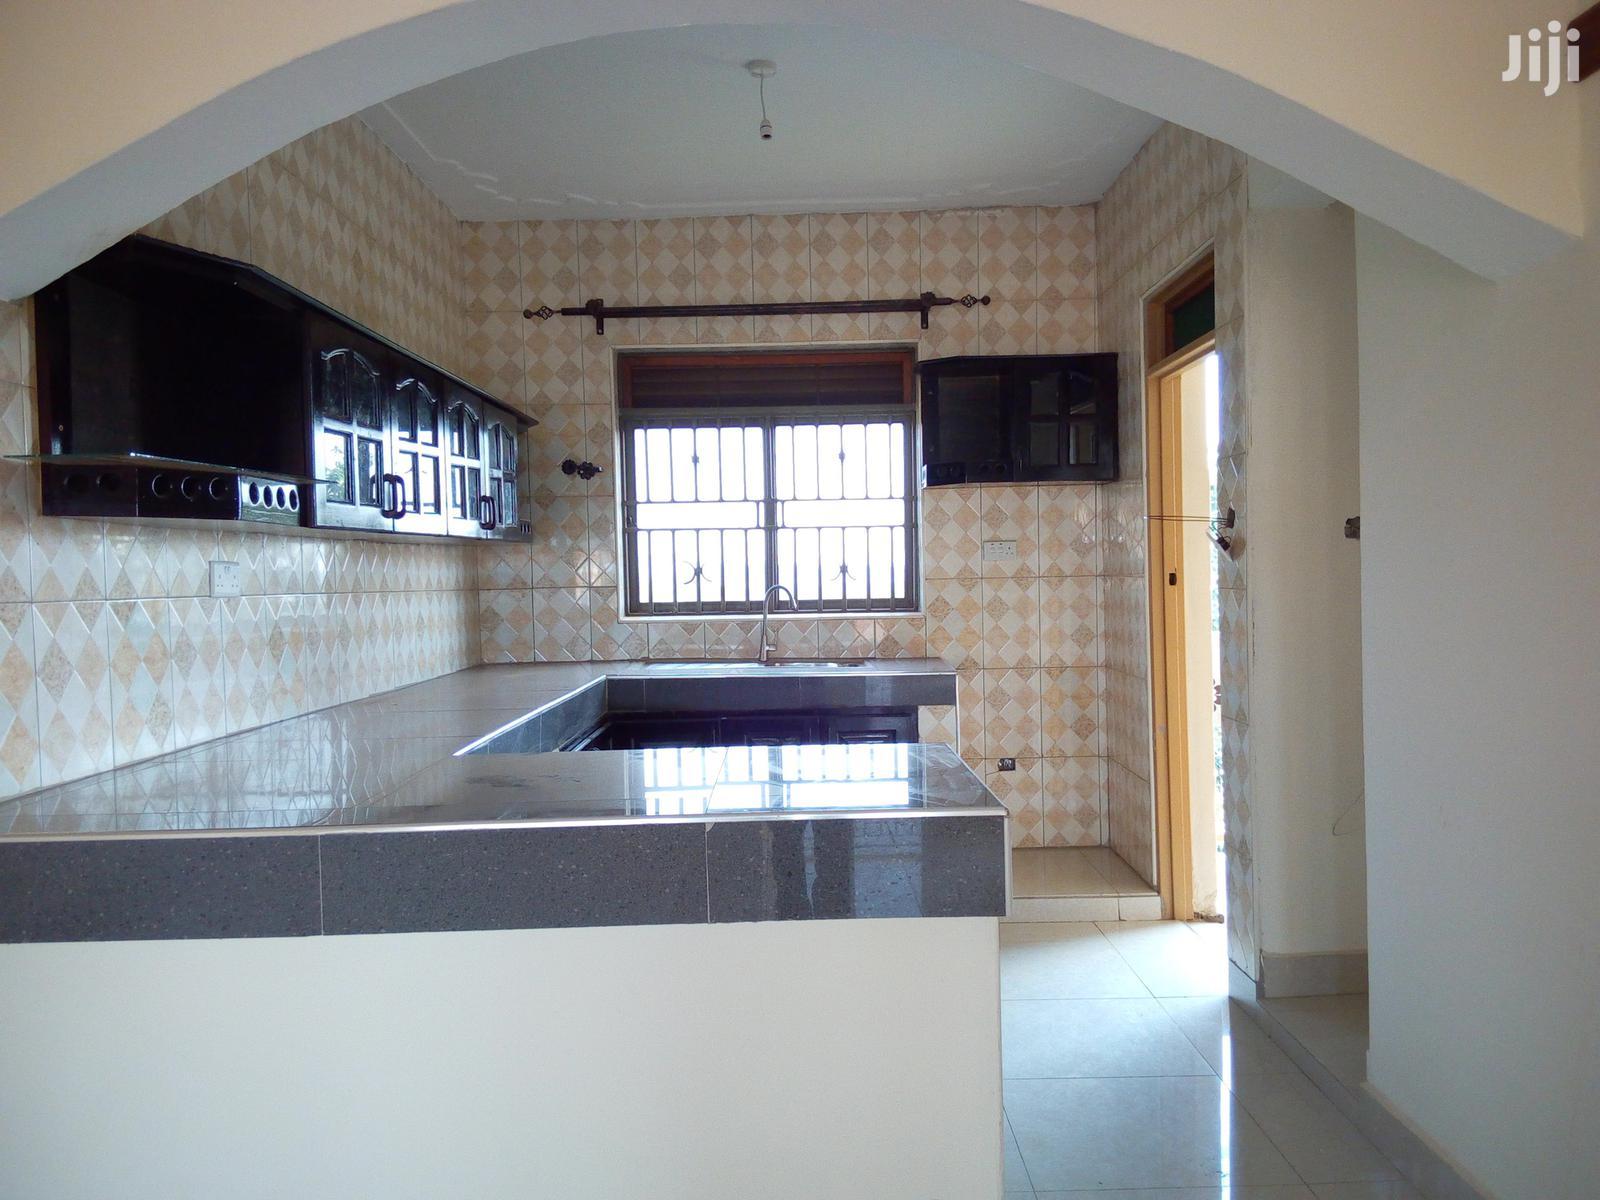 NAMUGONGO Three Bedroom New Apartment For Rent